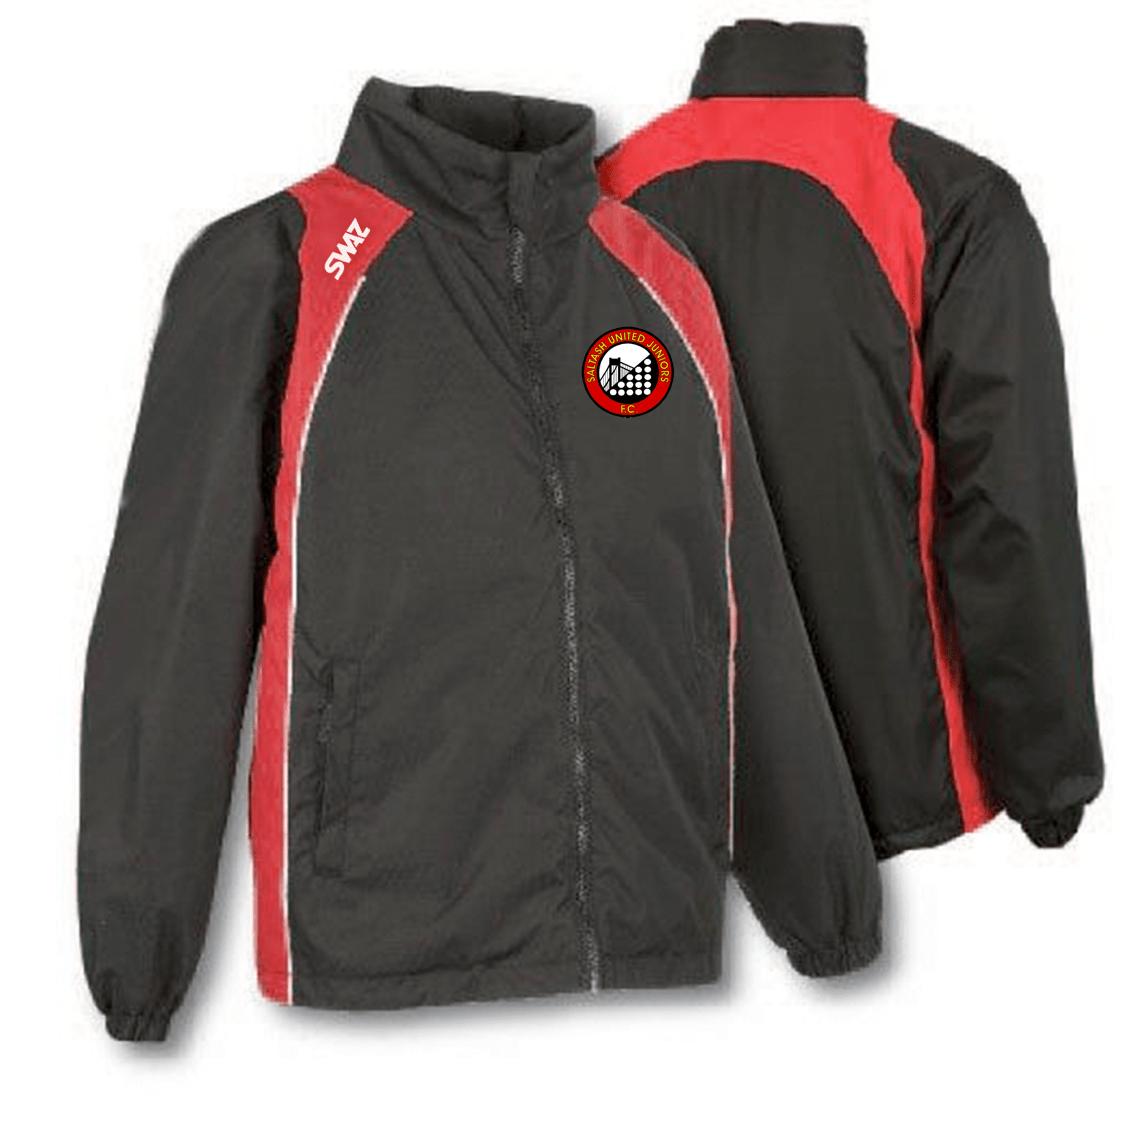 Saltash United Juniors Showerproof Jacket | SWAZ Teamwear |